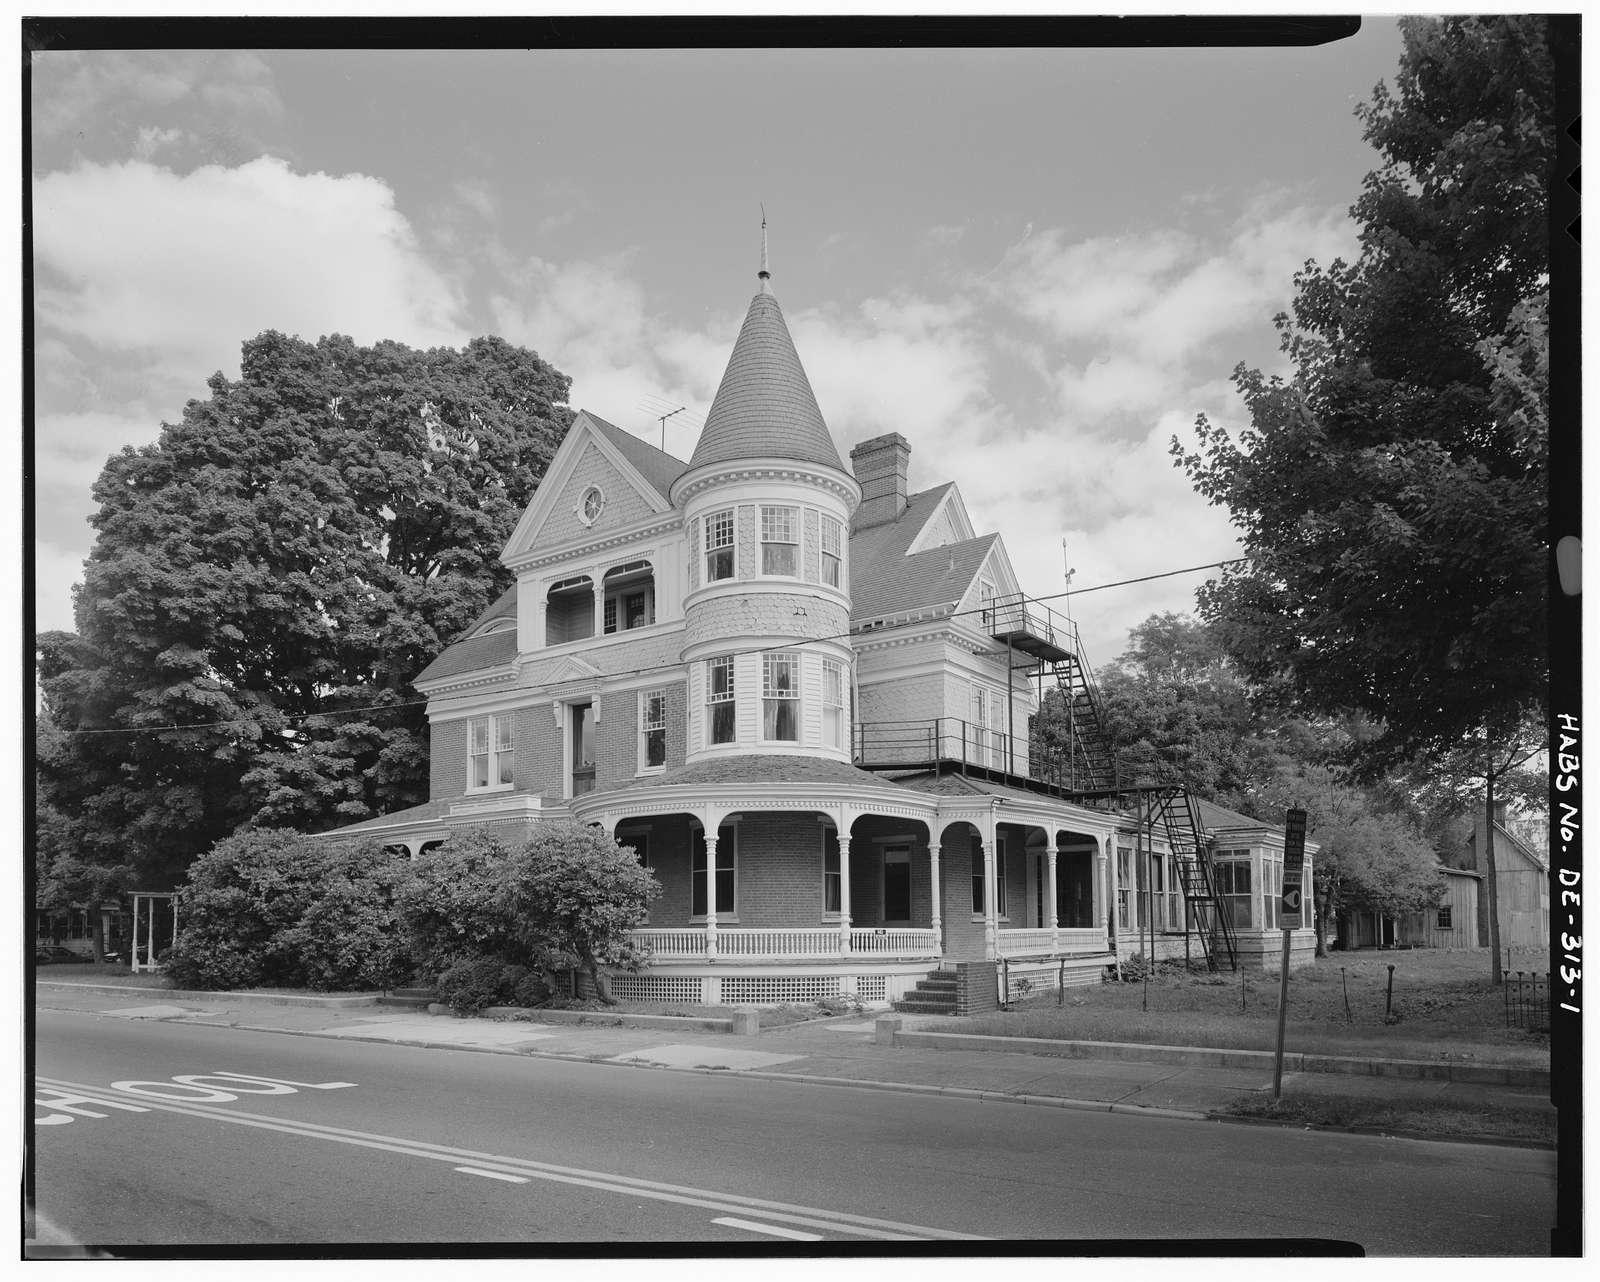 Richardson Hall, East Dover Hundred, 29 North State Street, Dover, Kent County, DE